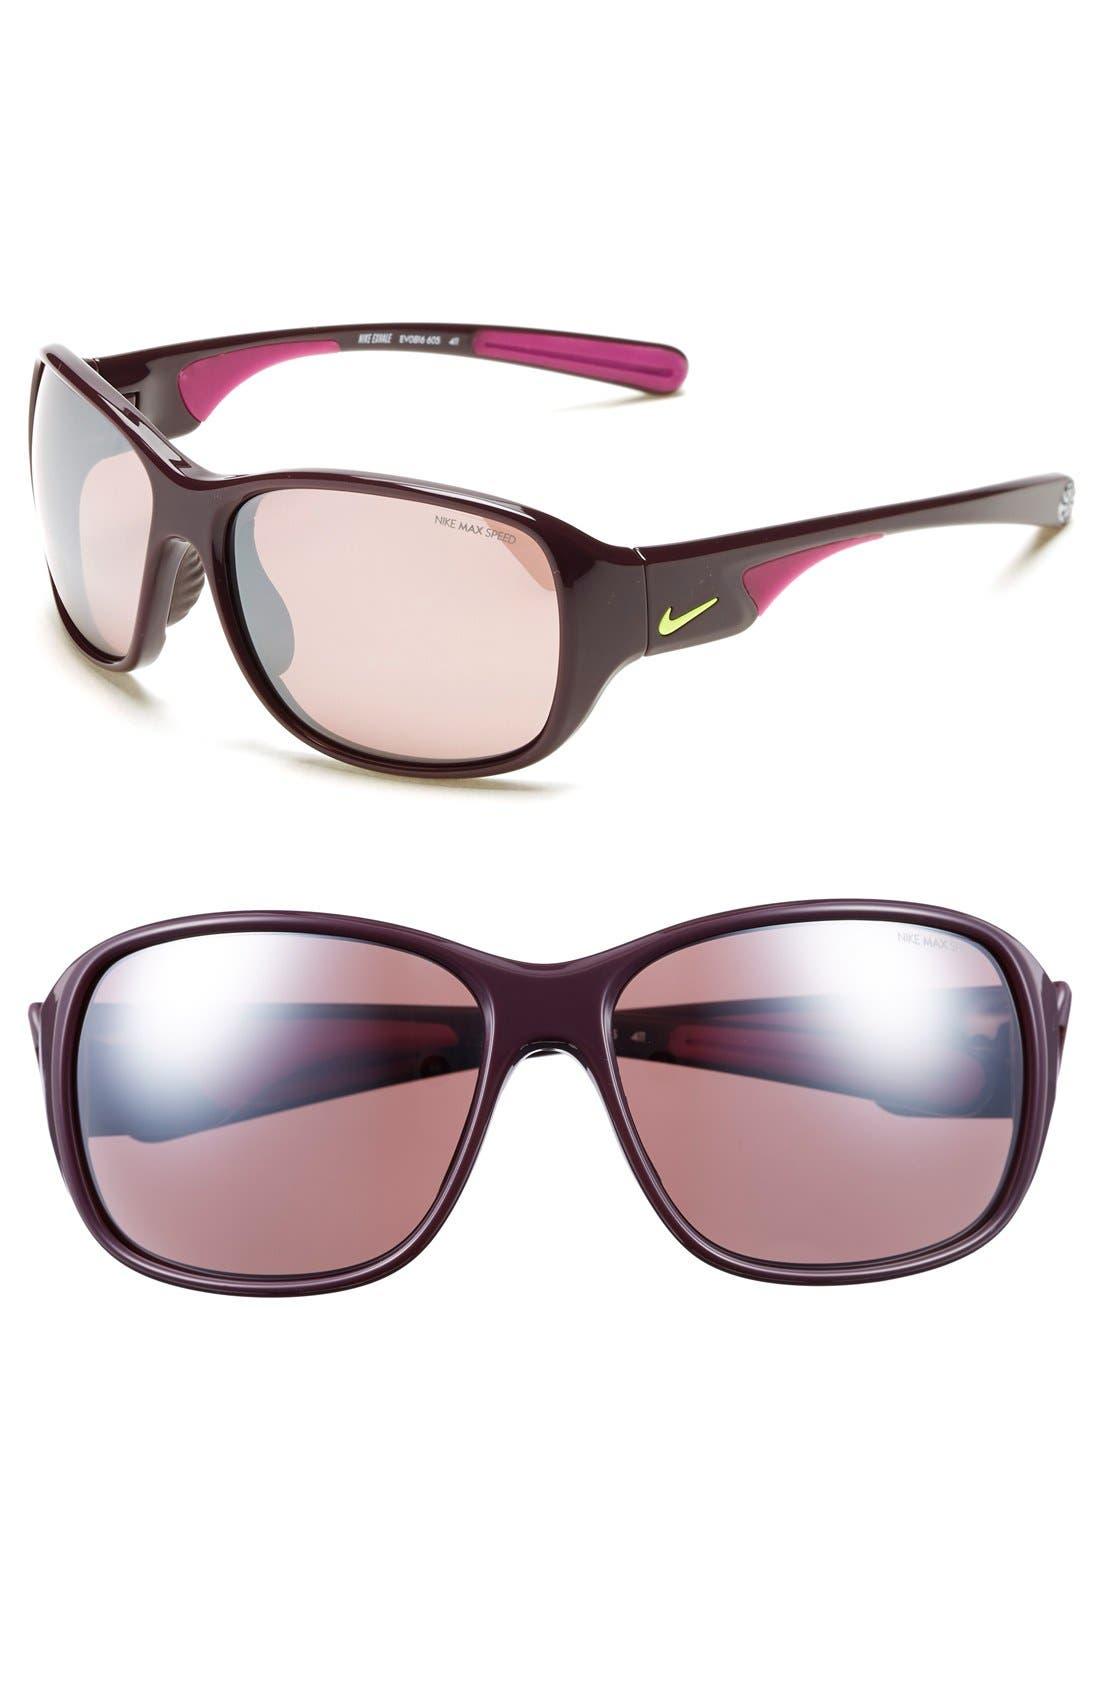 Main Image - Nike 'Exhale' 59mm Sunglasses